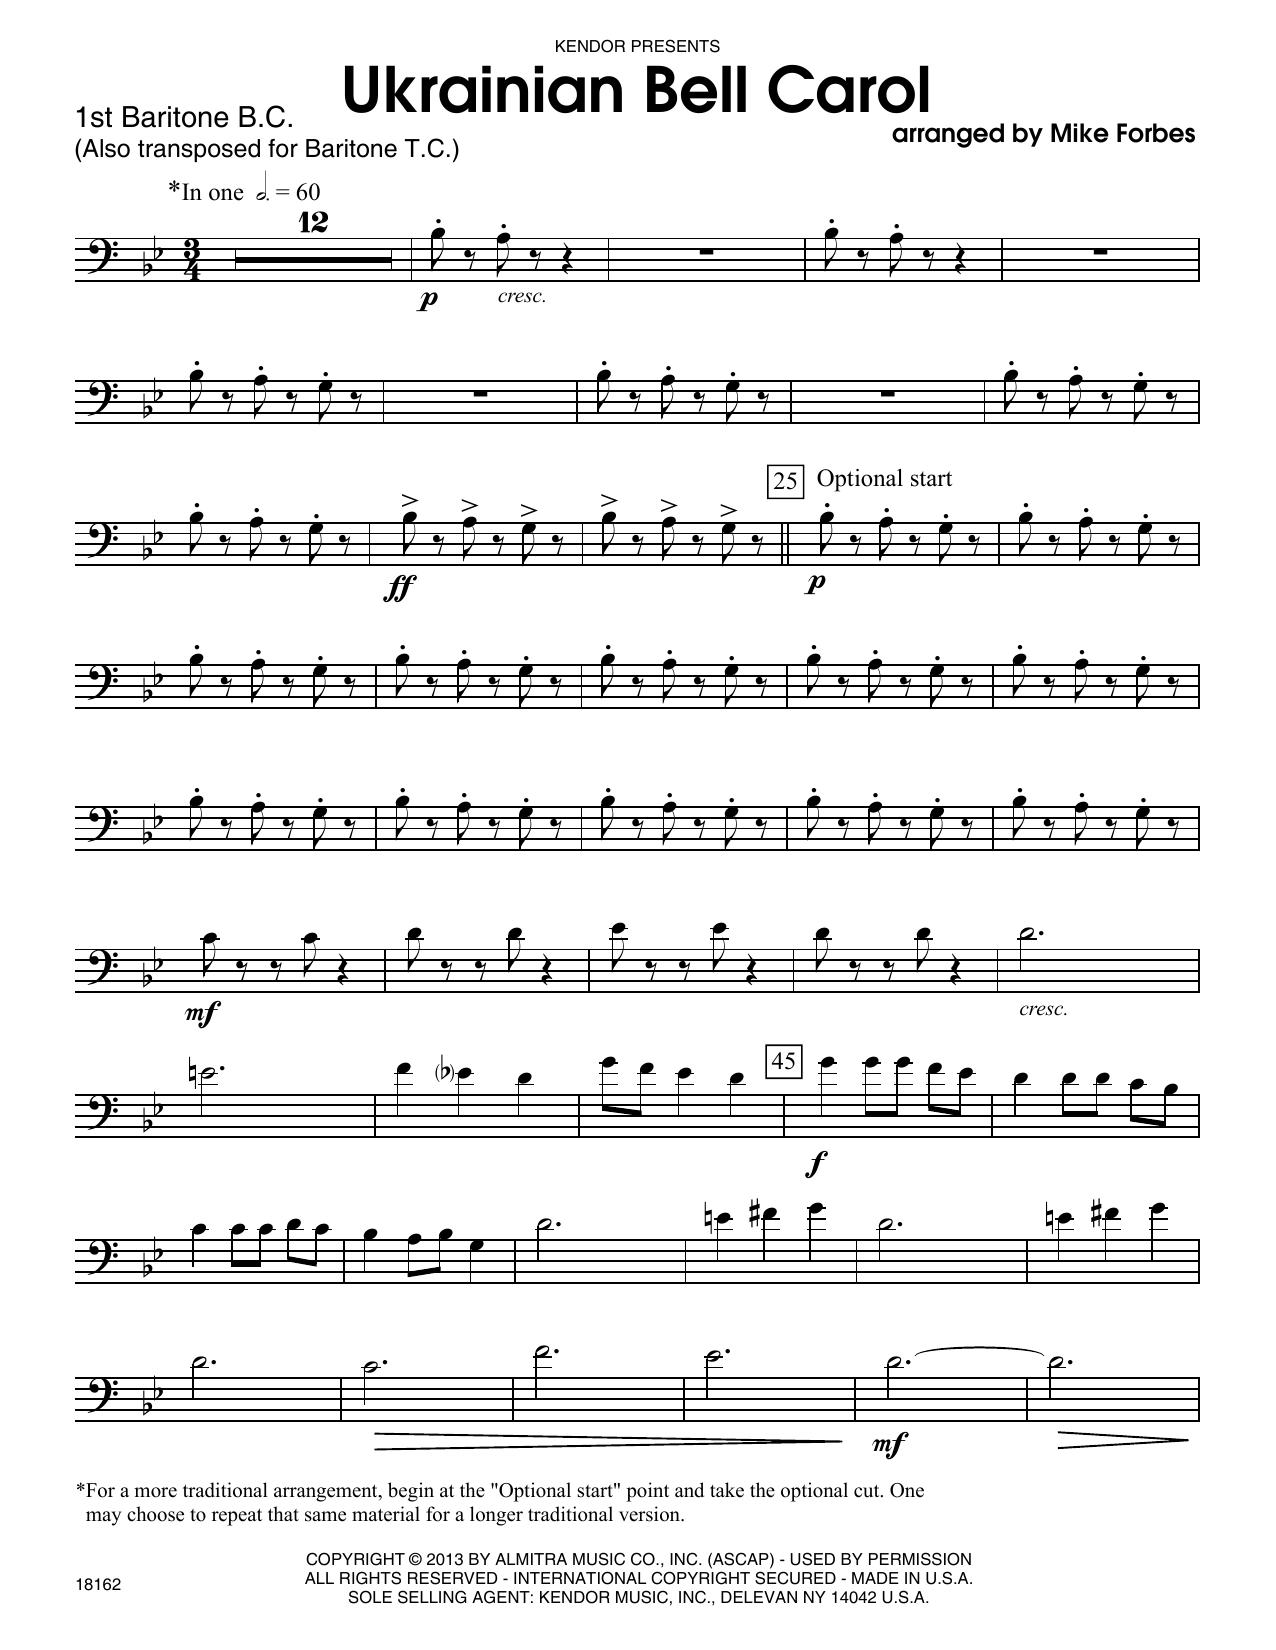 Ukrainian Bell Carol - 1st Baritone B.C. Sheet Music